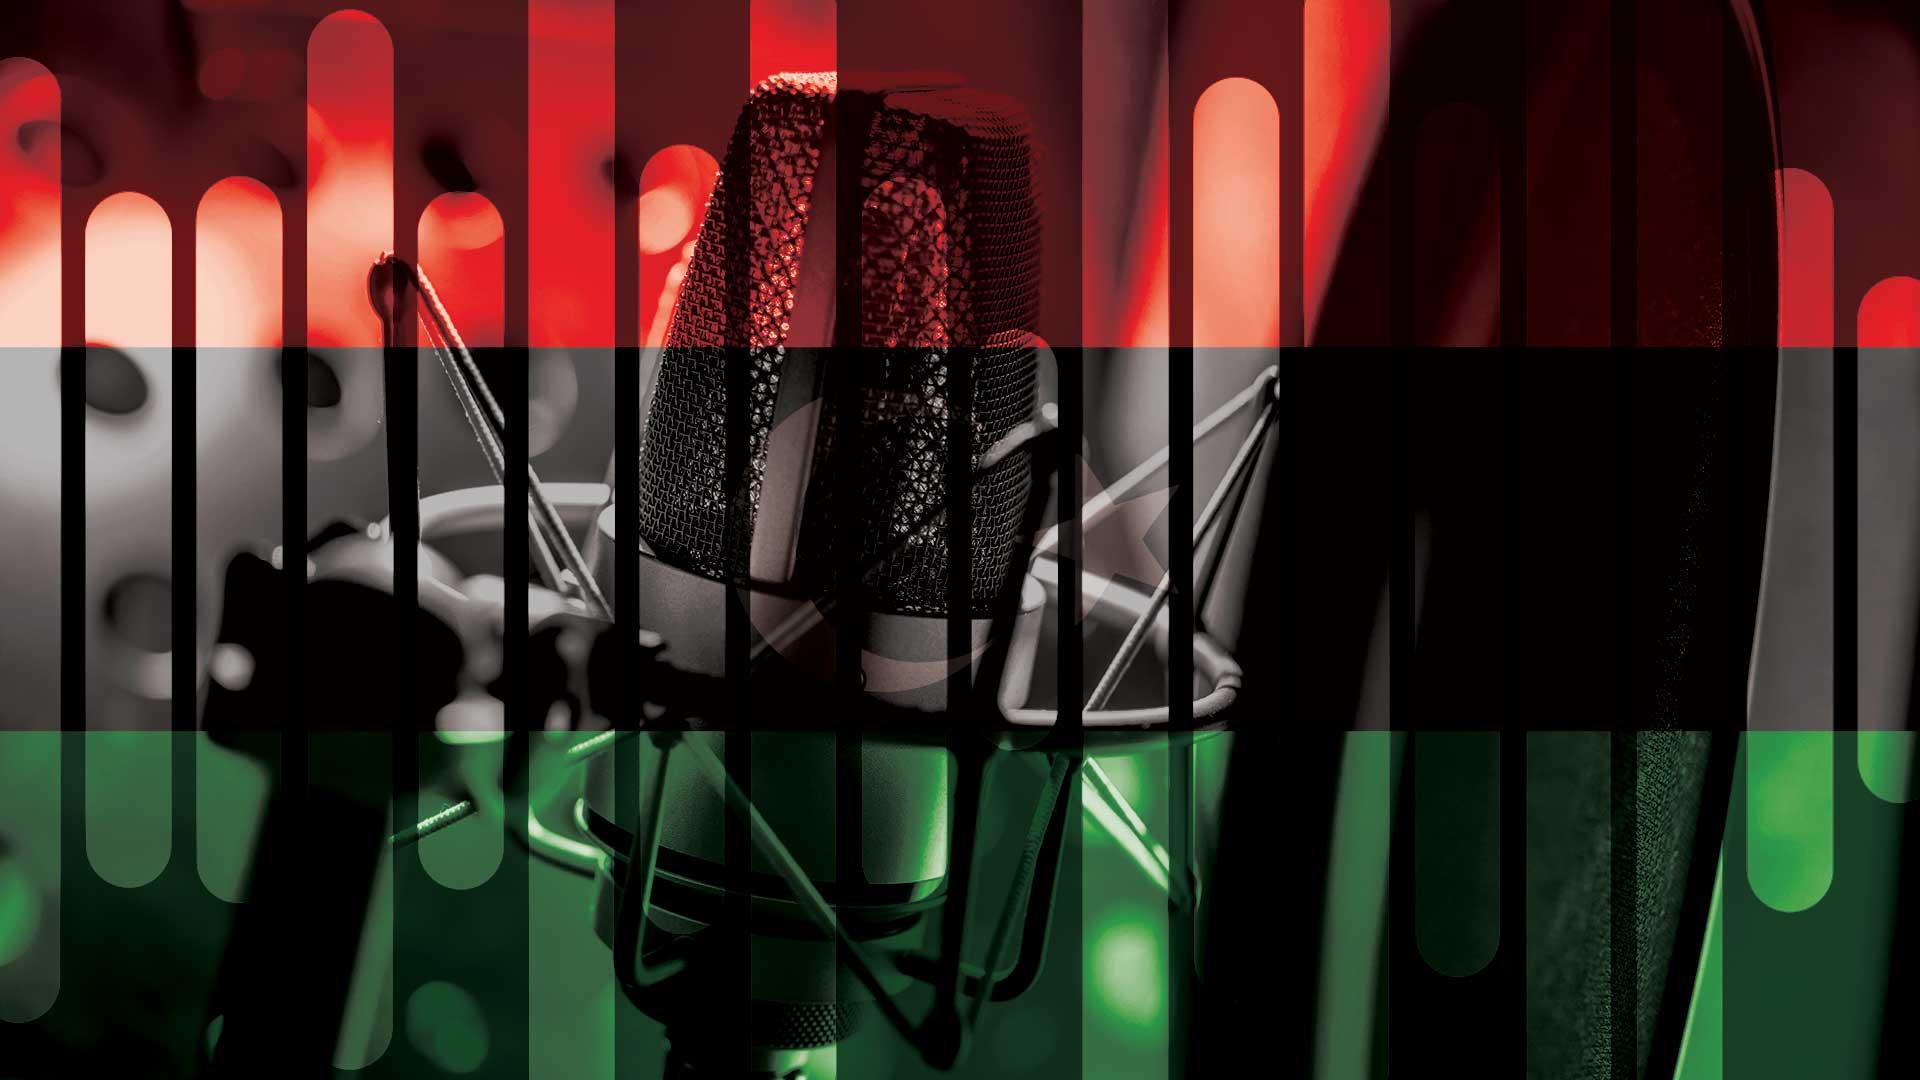 Voice-Over Services Libya - Voquent